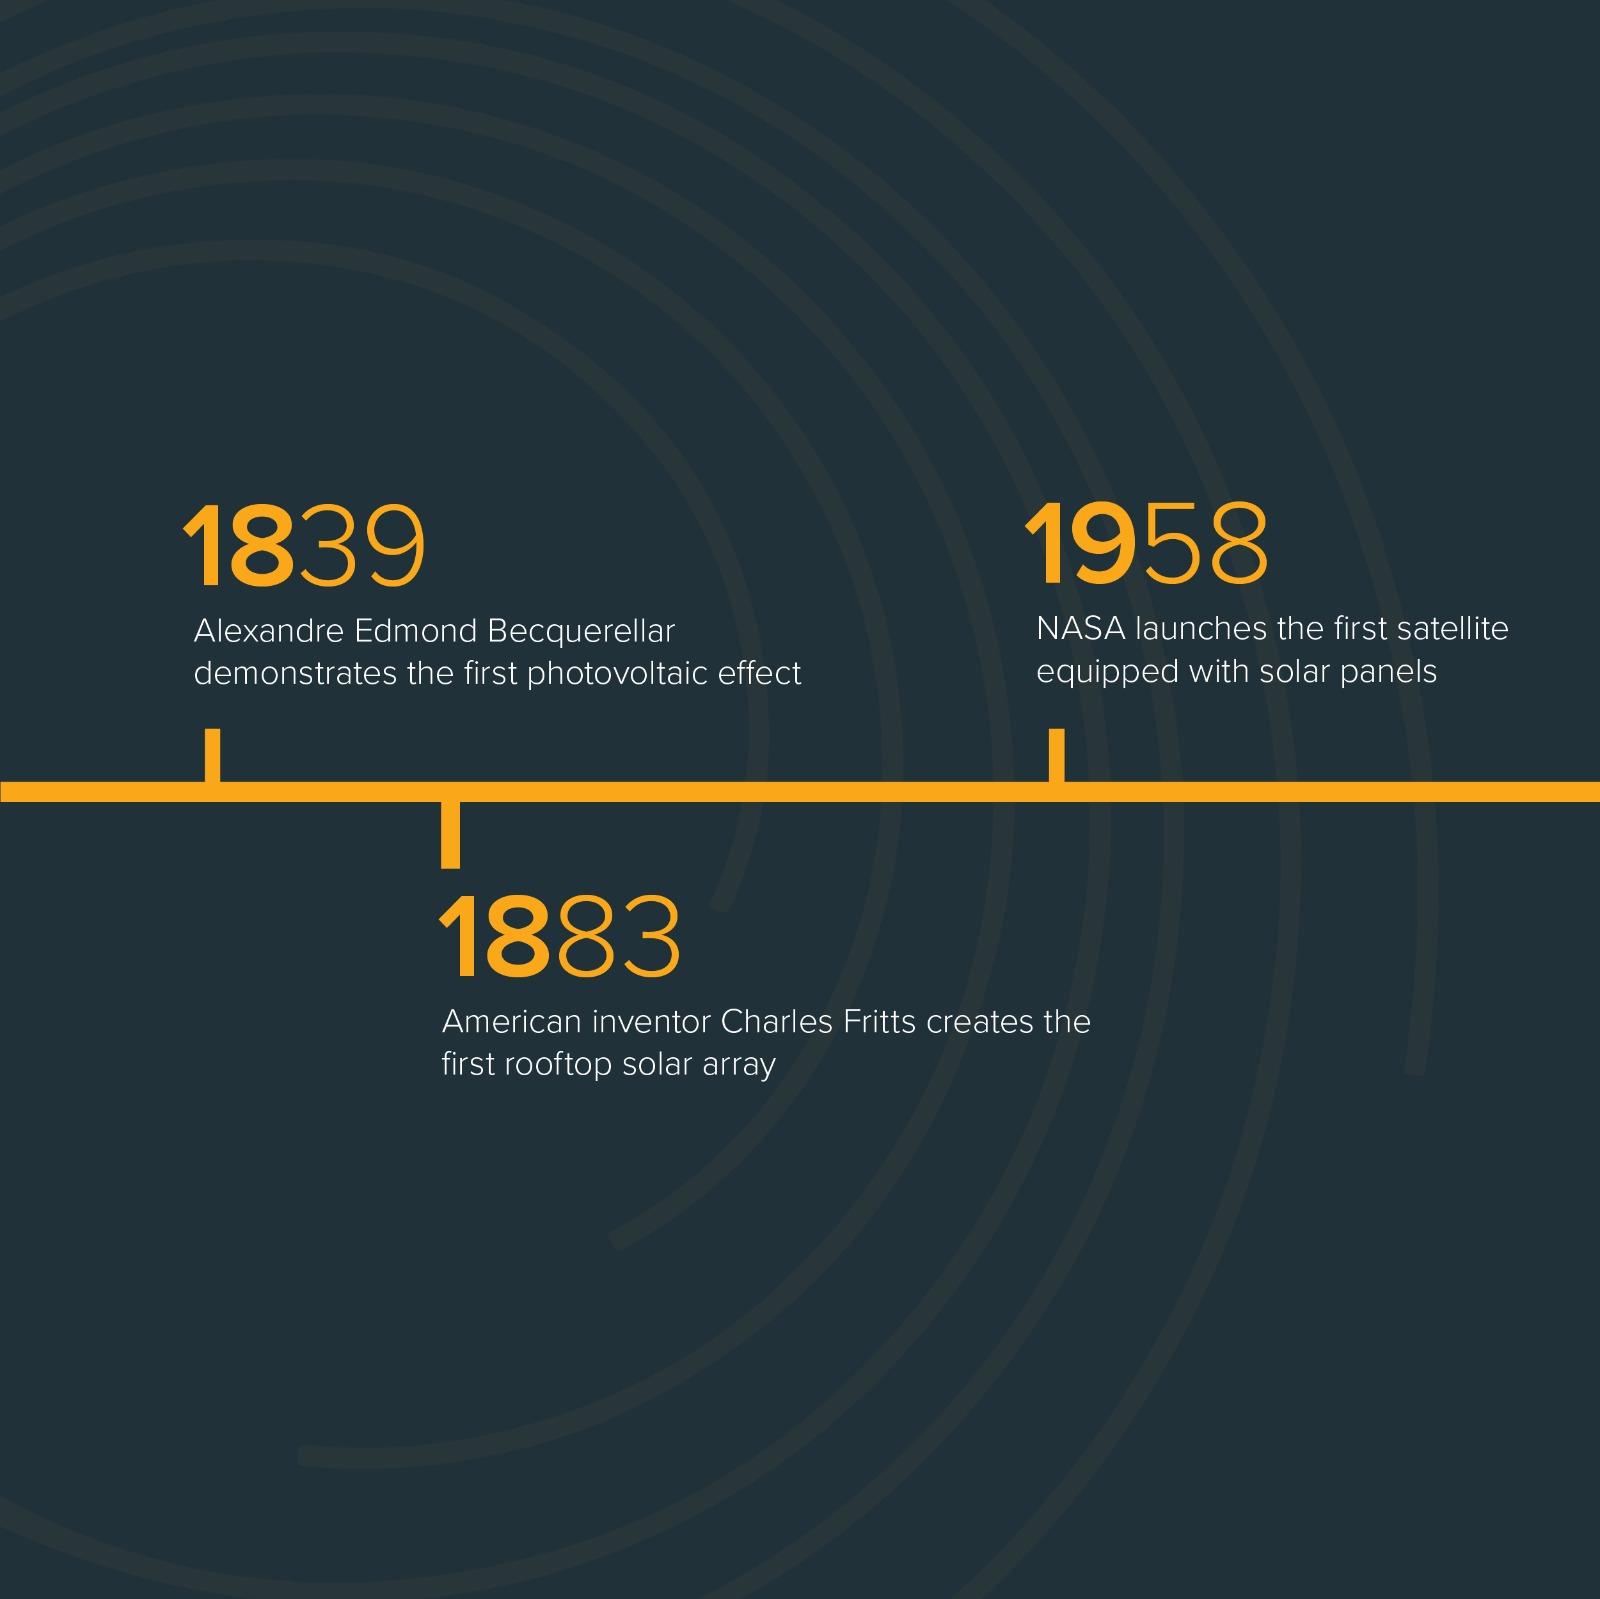 VS History of Solar Panels